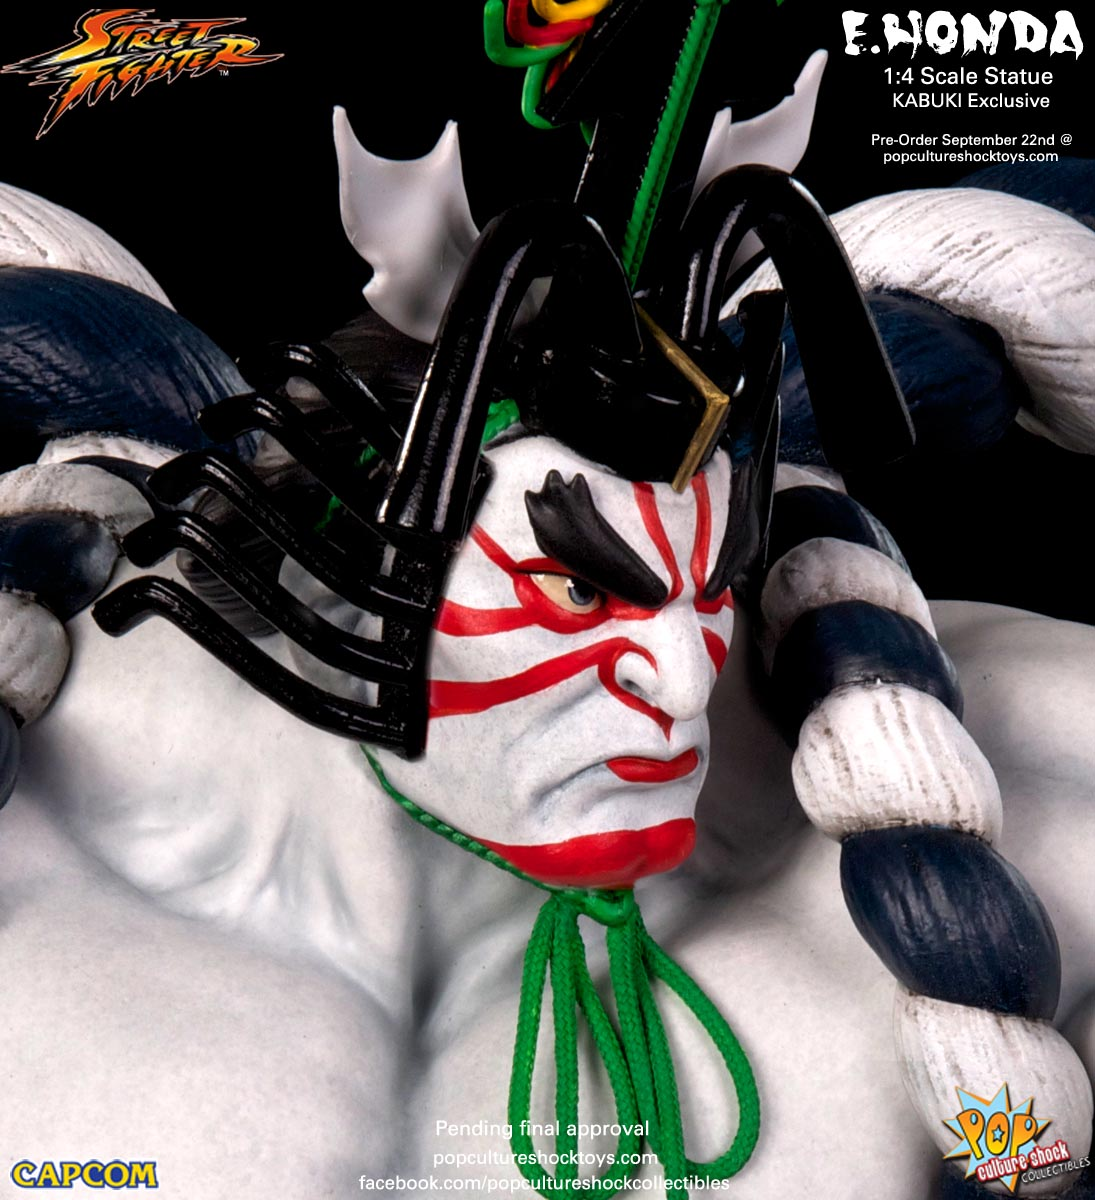 [Pop Culture Shock] Street Fighter: E. Honda 1/4 Statue - Página 3 Street-Fighter-E.-Honda-Kabuki-Statue-020